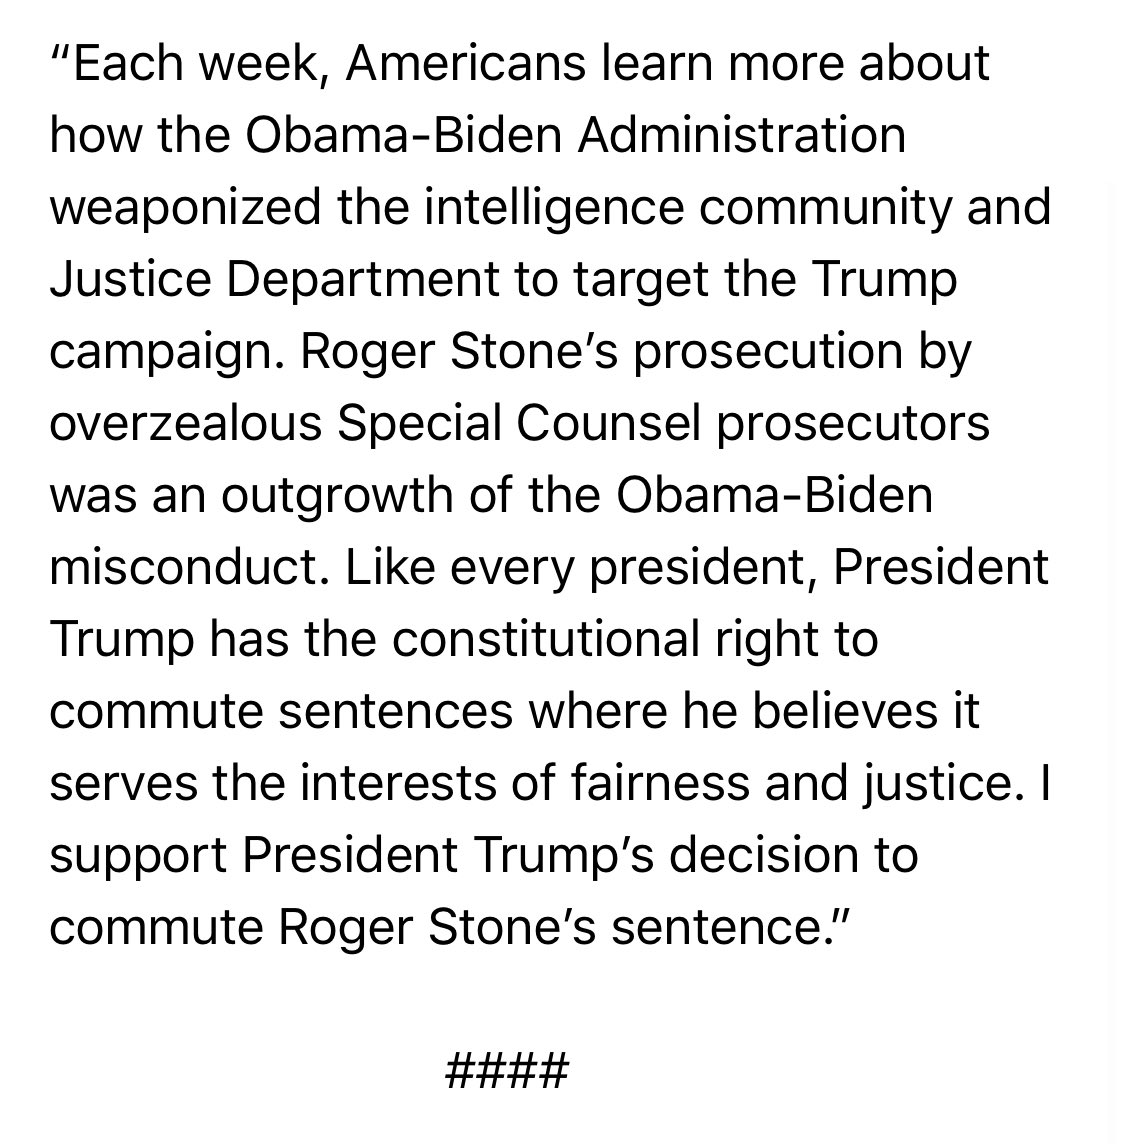 🚨#BREAKING: Read Ranking Member @Jim_Jordan's statement on President Trump's decision to commute Roger Stone's sentence.